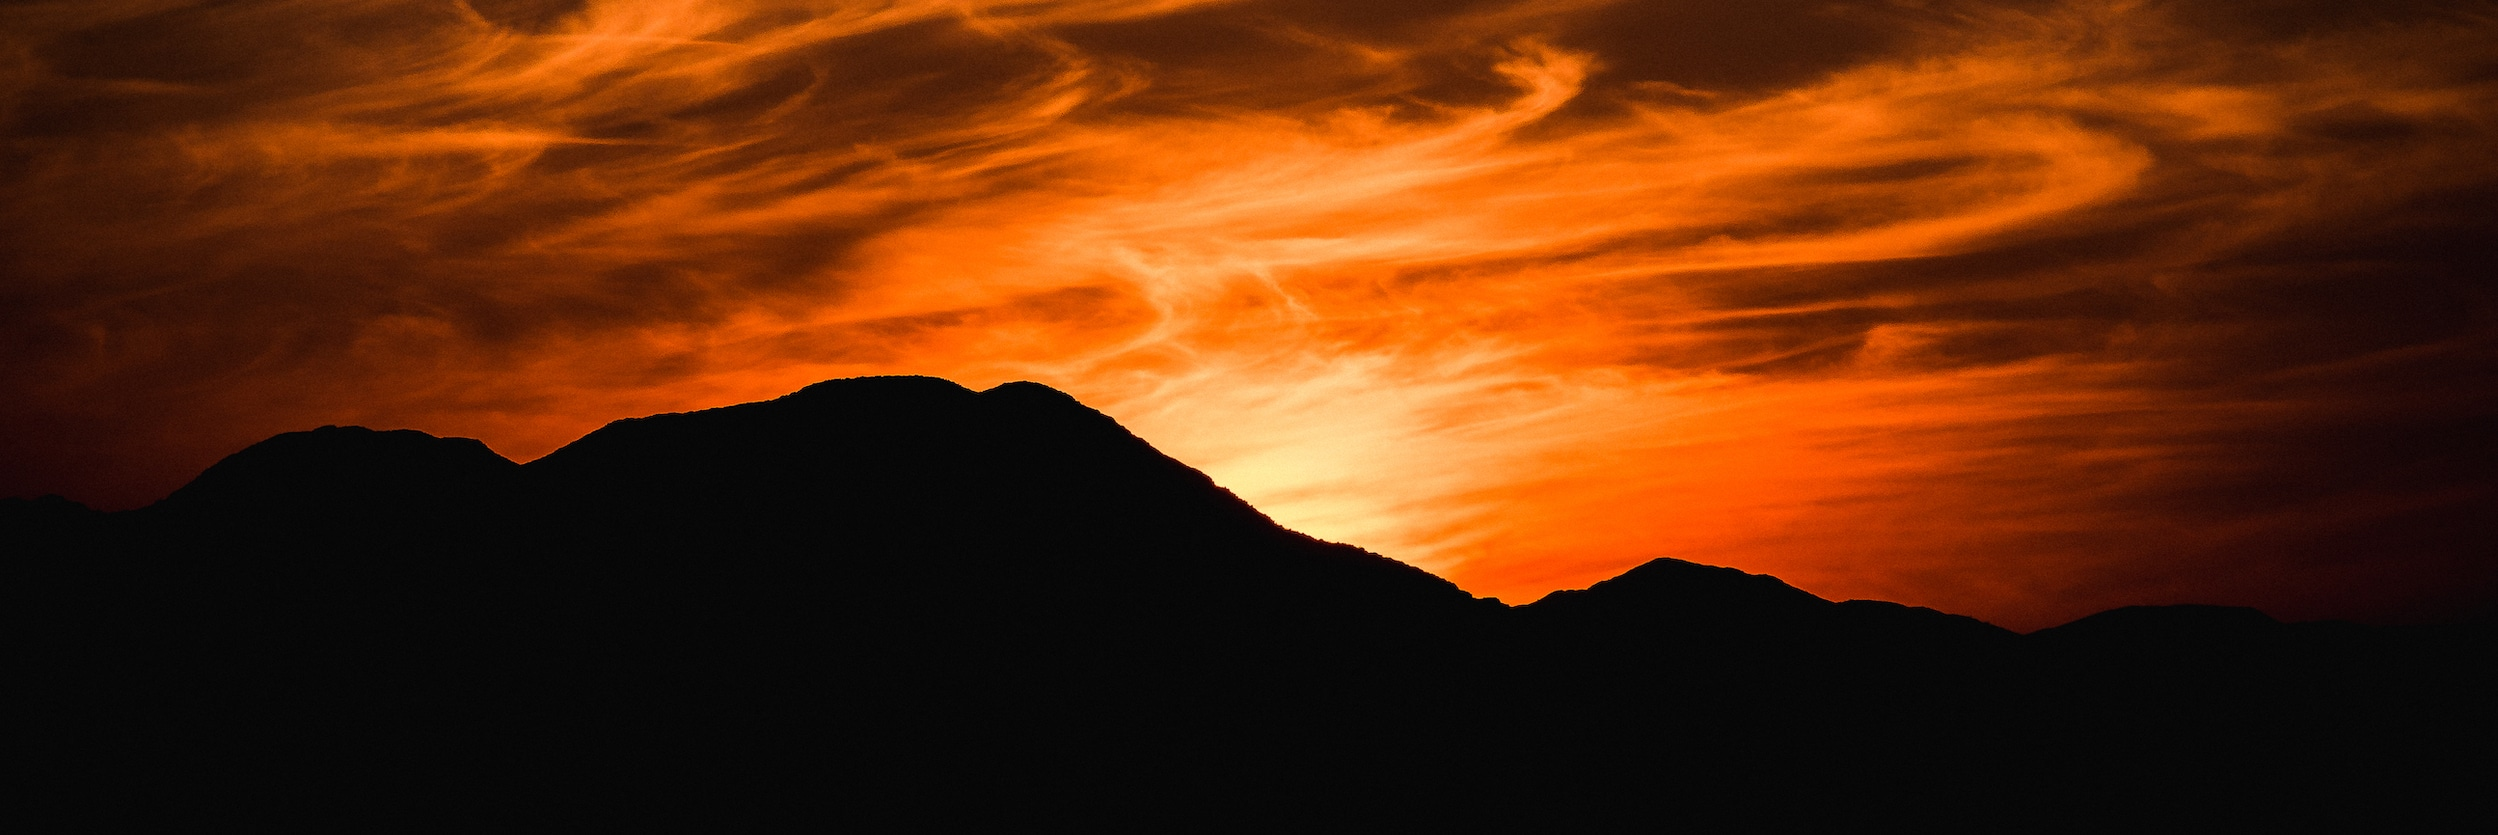 Sunset in Namibia, mountain bike tours worldwide